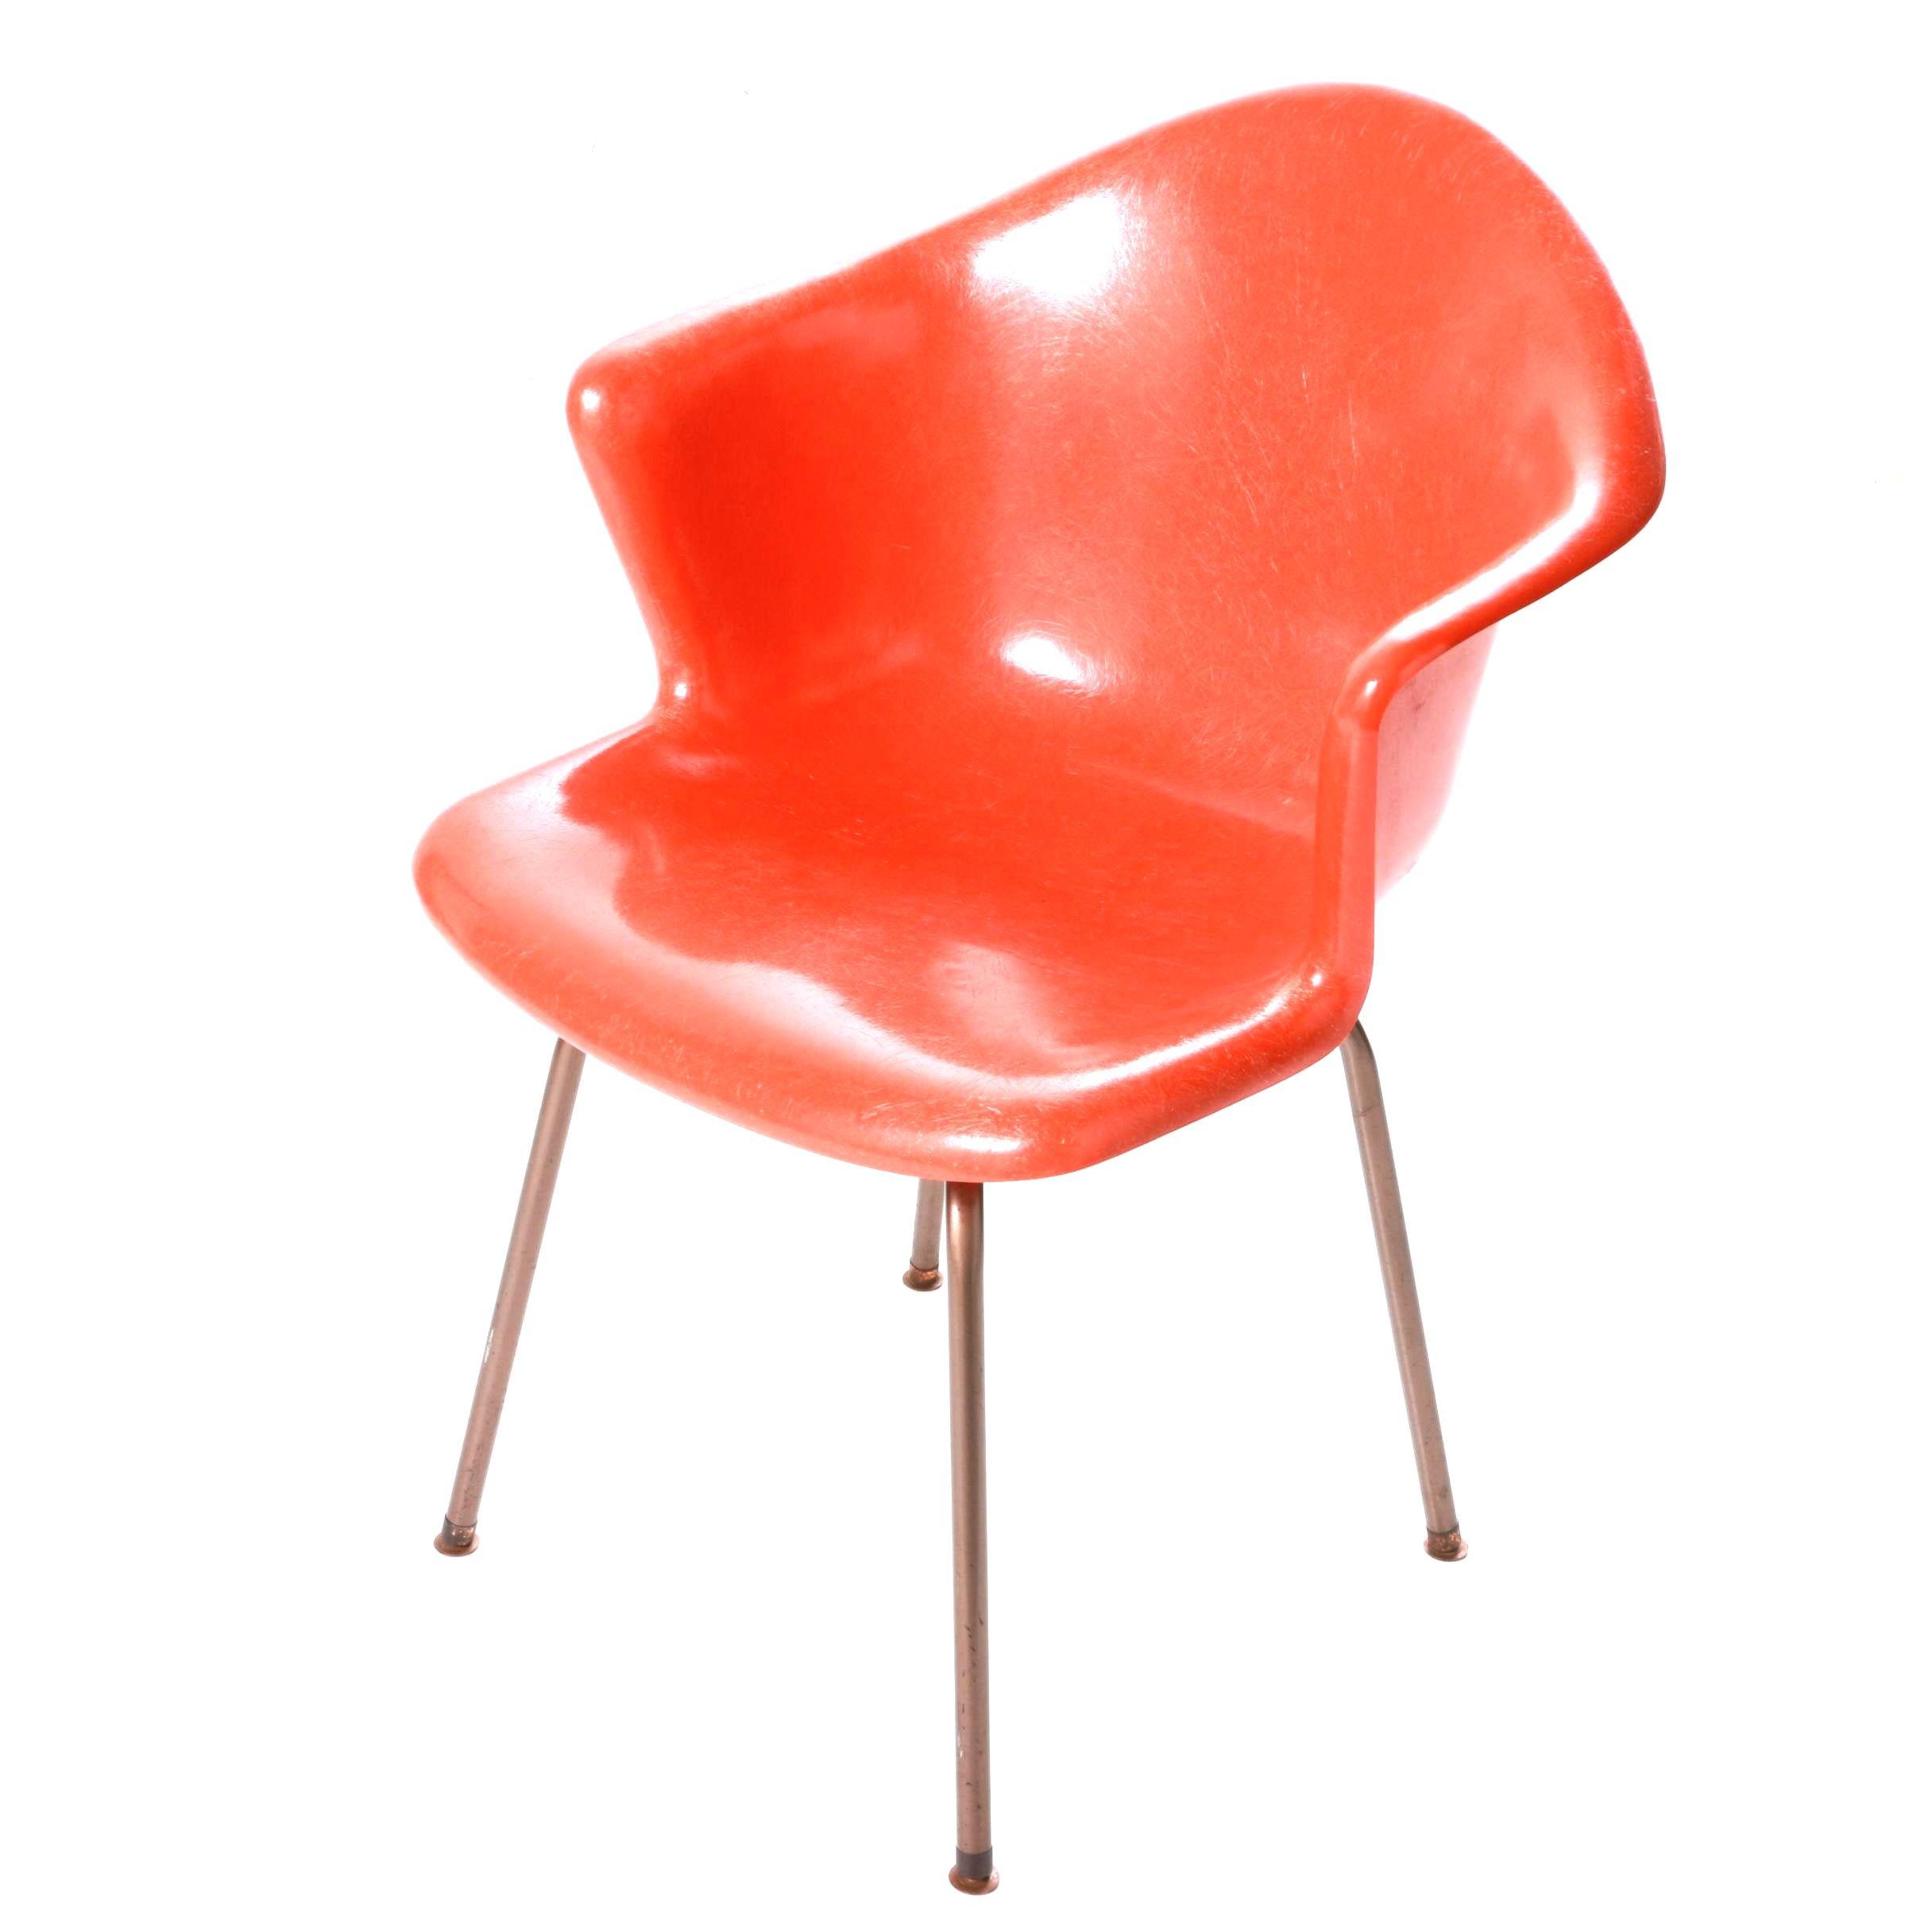 Vintage Mid Century Modern Fiberglass Chair by Douglas Furniture Corporation